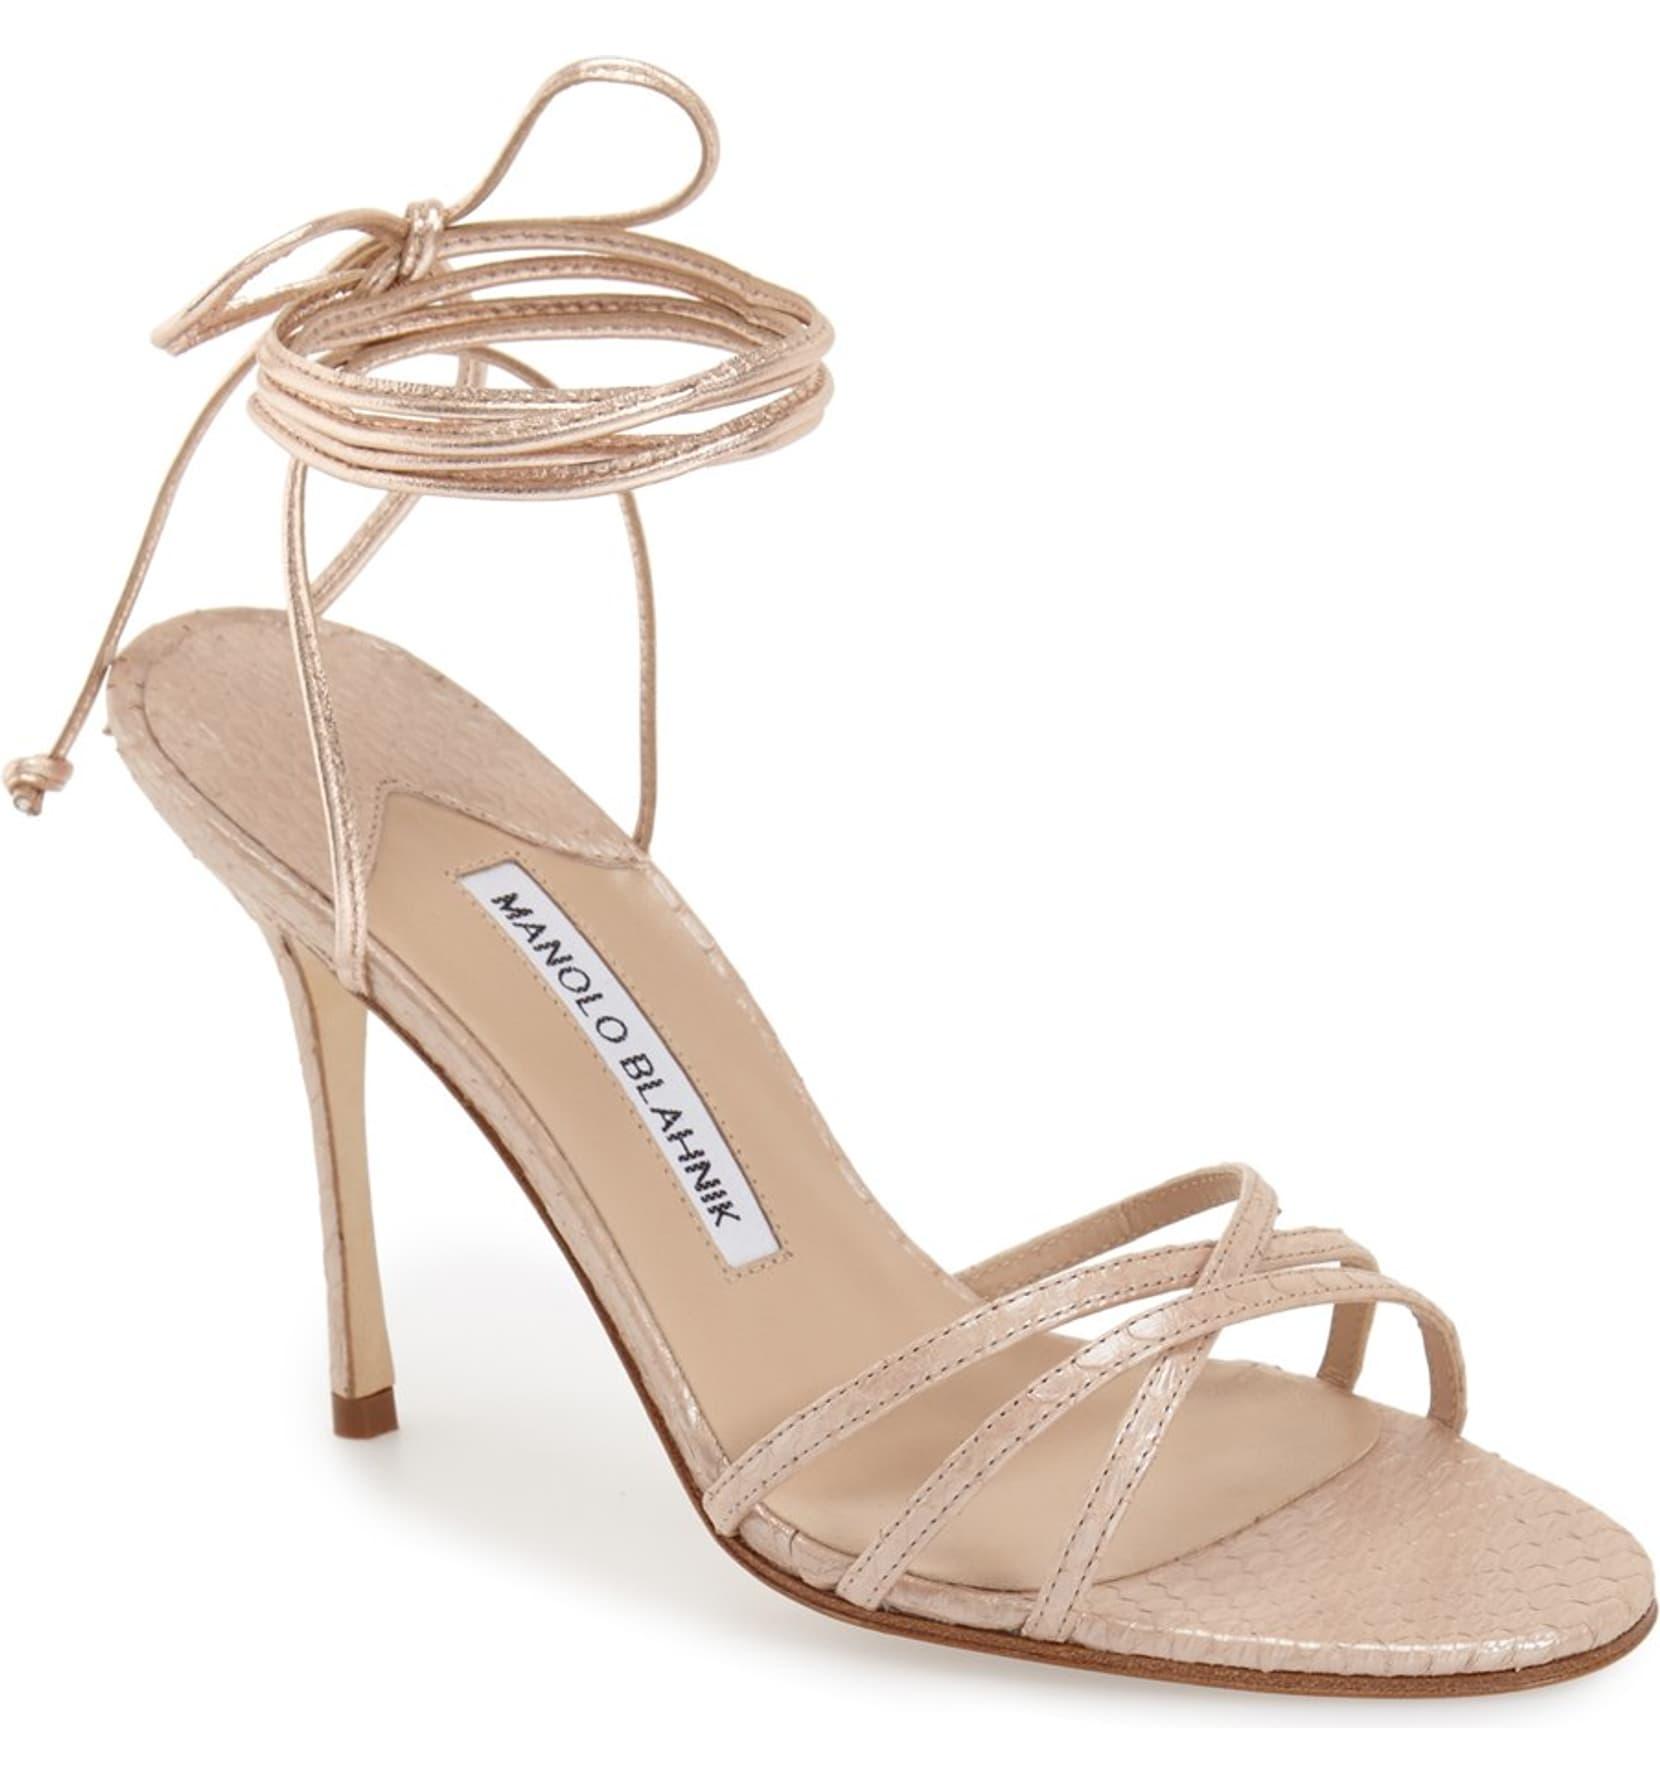 Leva Sandals by Manolo Blahnik, available on nordstrom.com Kim Kardashian Shoes Exact Product